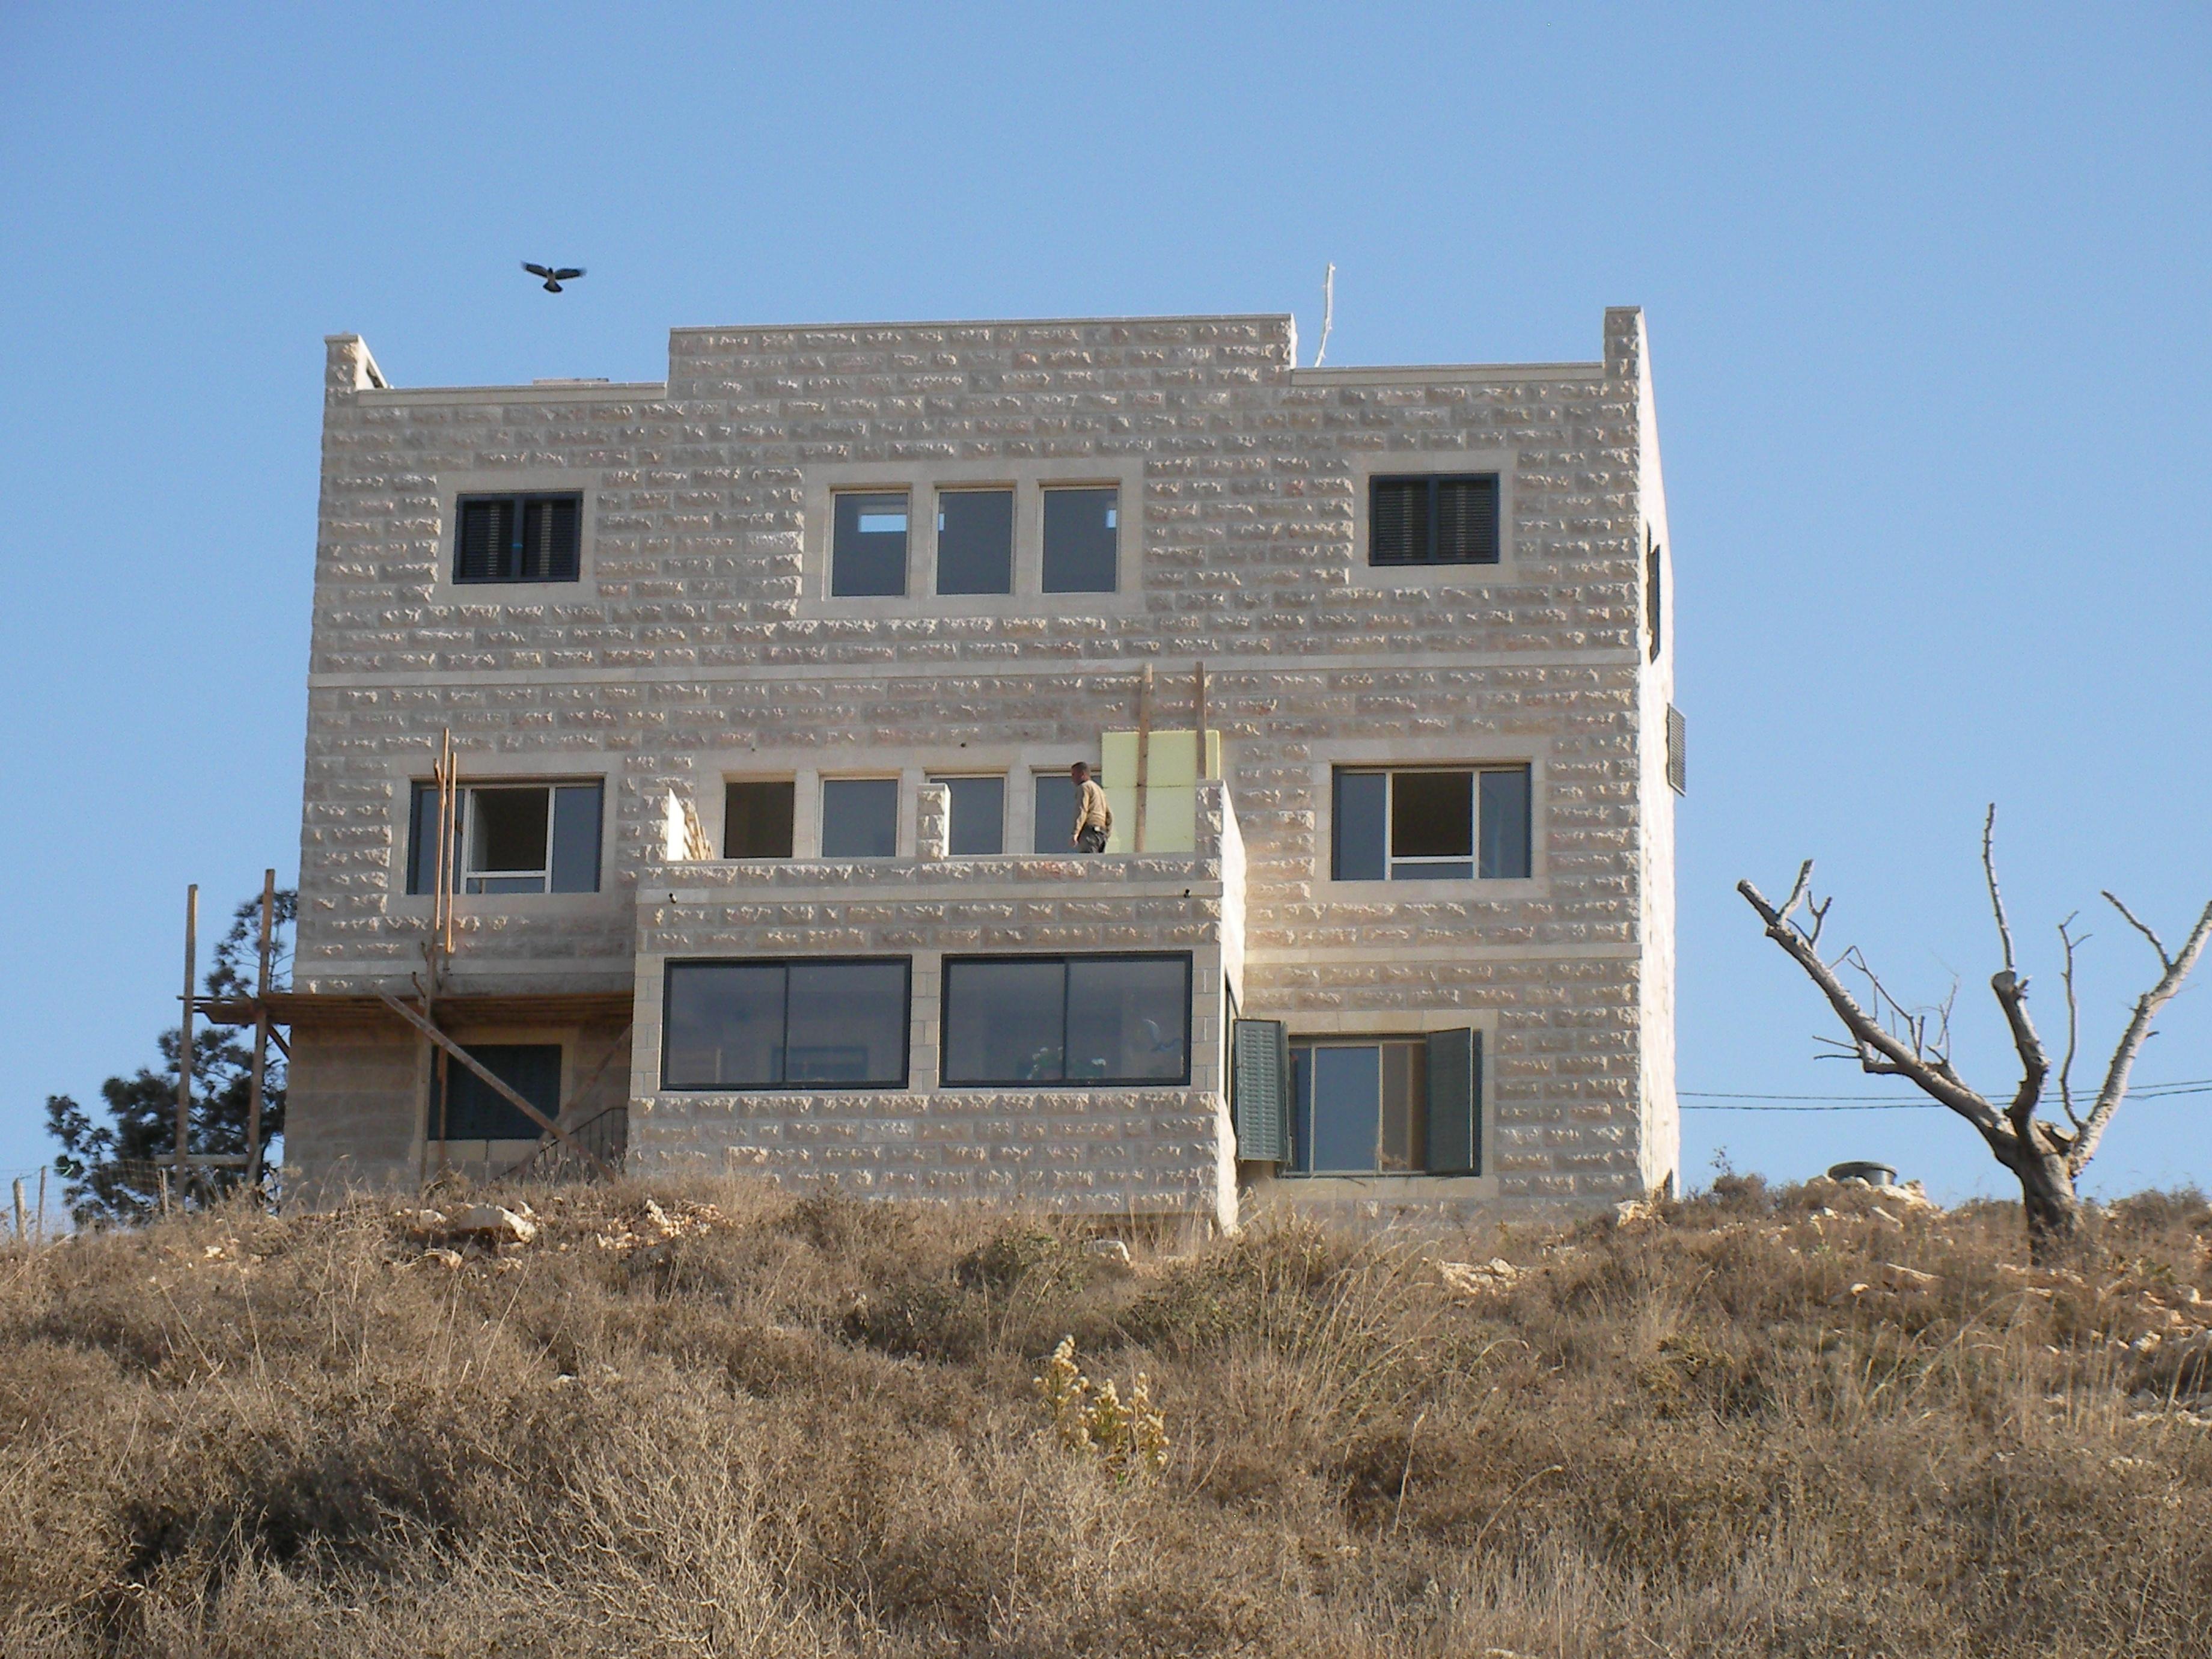 A Permanent home in the illegal outpost of Derech Ha'avot, near Bethlehem